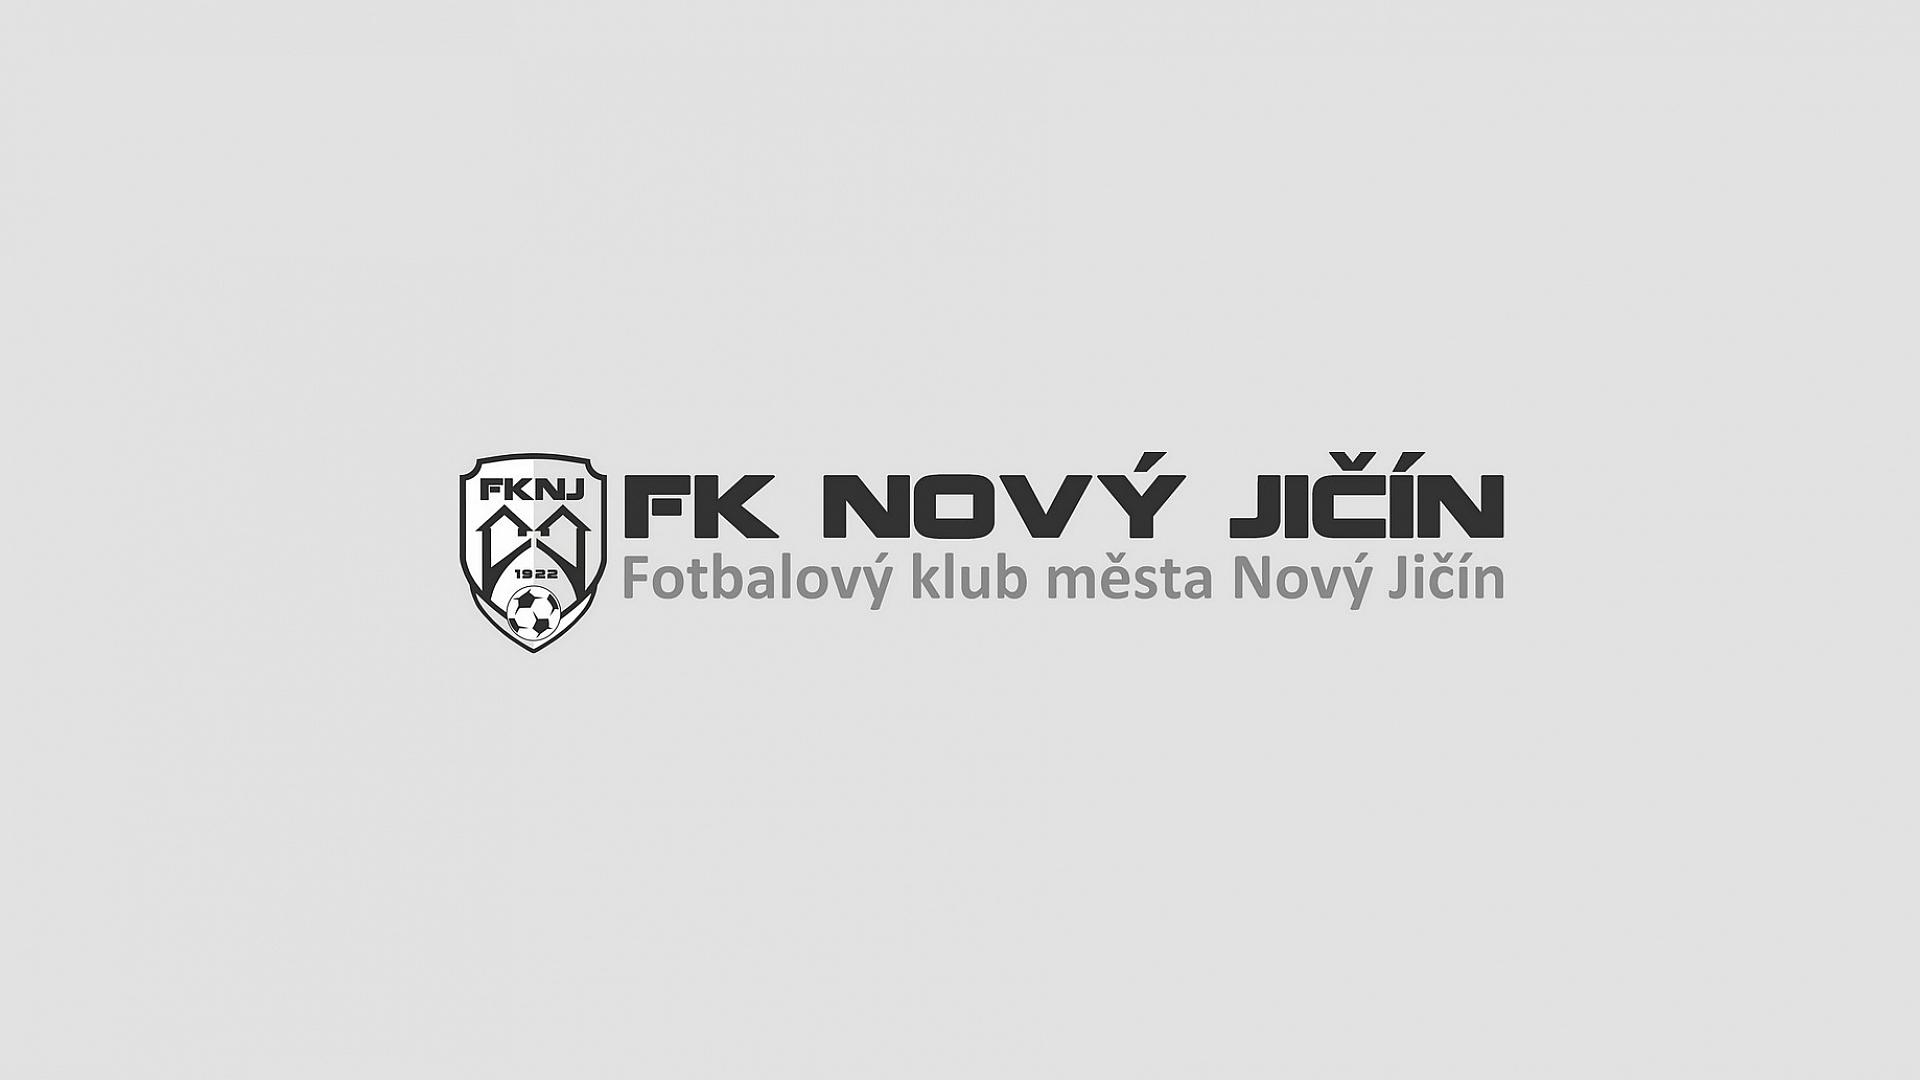 Obce2020.cz - Fotbalový klub Nový Jičín: Logo s textem - šedé